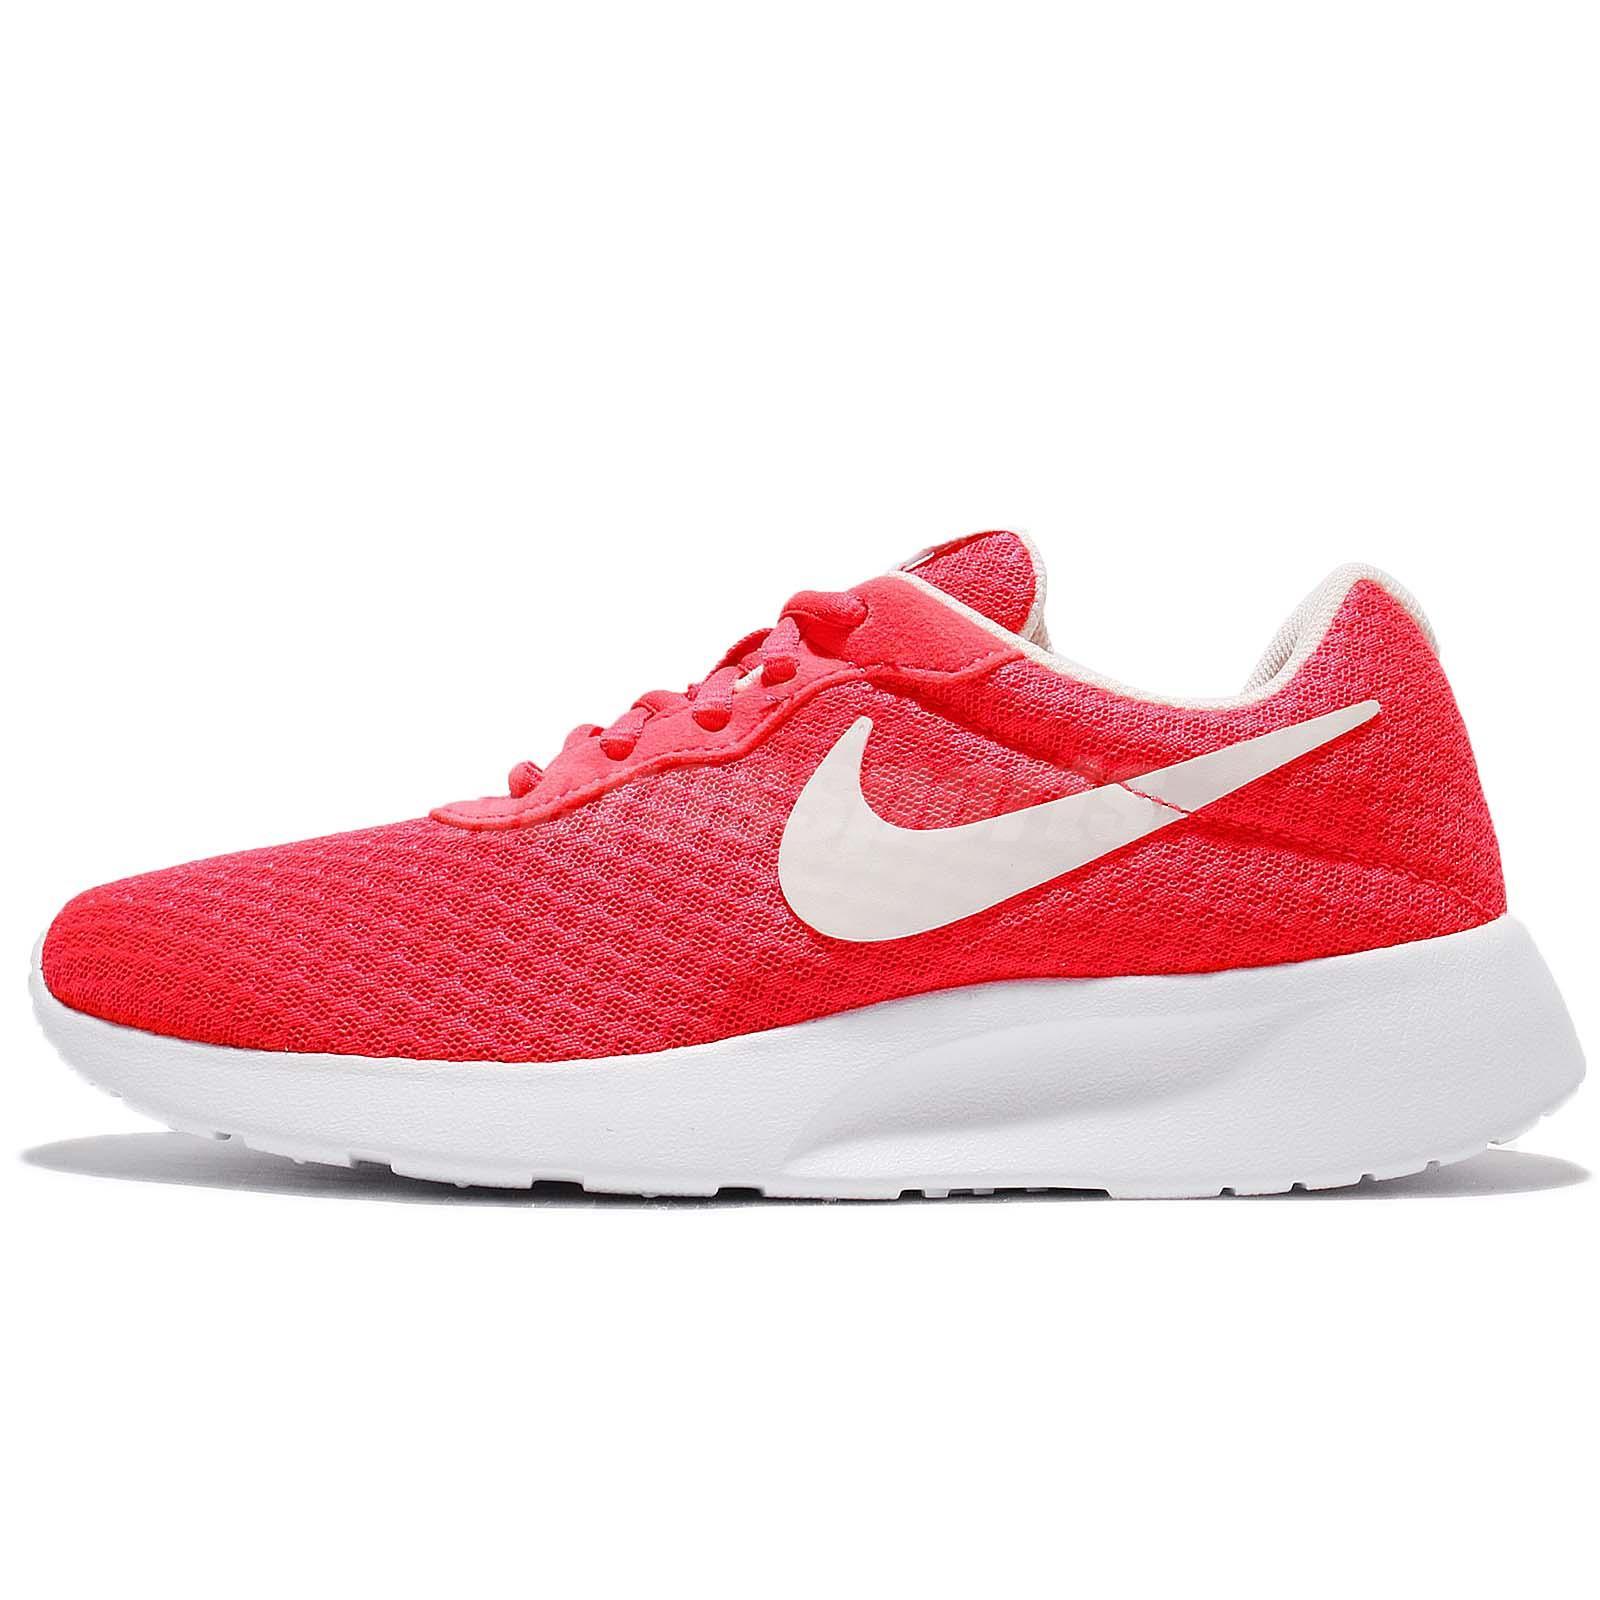 4b86ae30ff4 Wmns Nike Tanjun Solar Red LT Orewood Women Shoes Sneakers Trainers 812655- 602